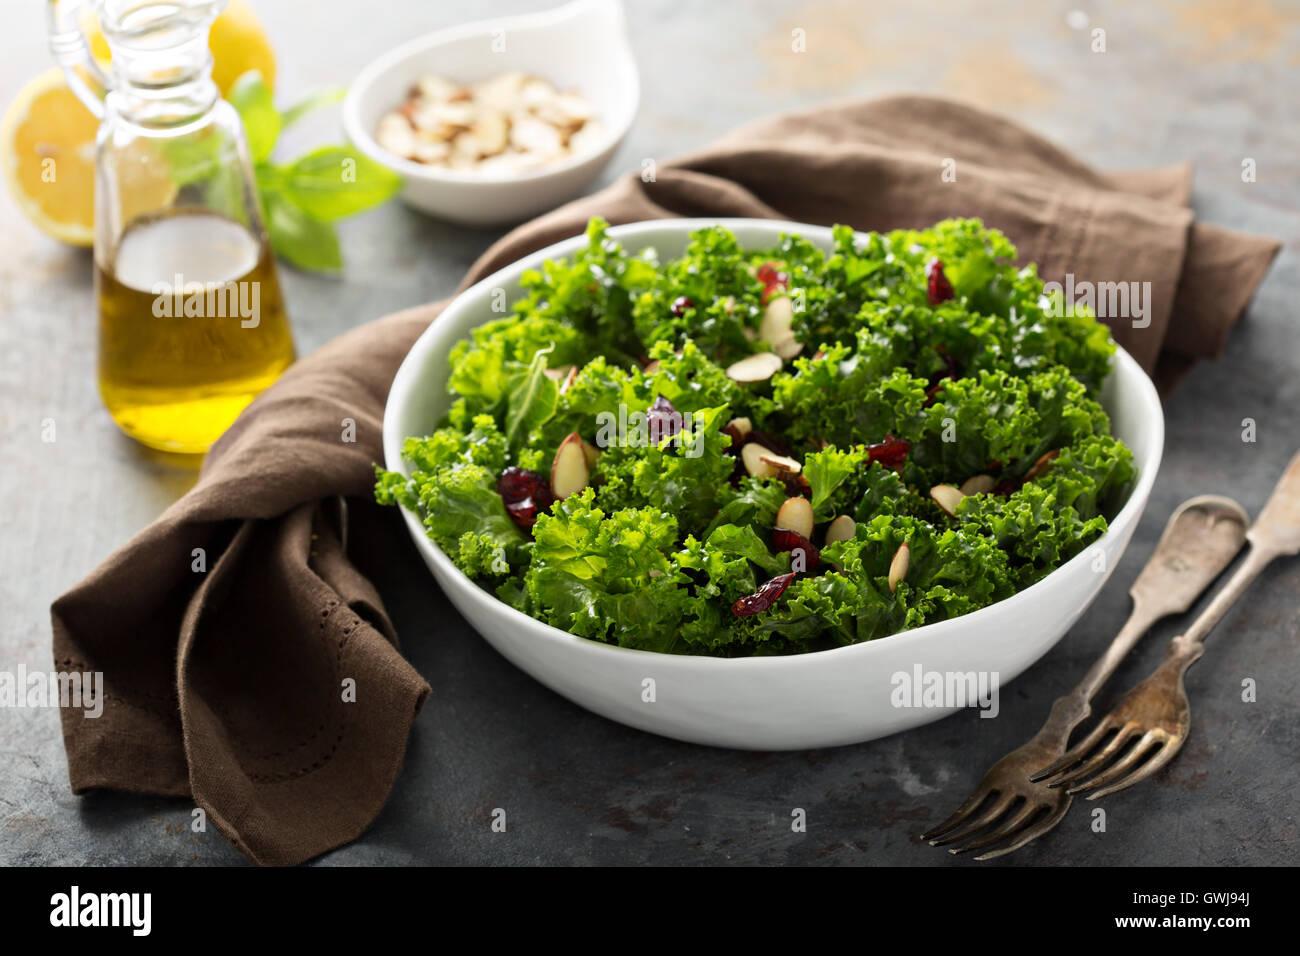 Frais sain avec salade de chou vert et Cranberry Photo Stock